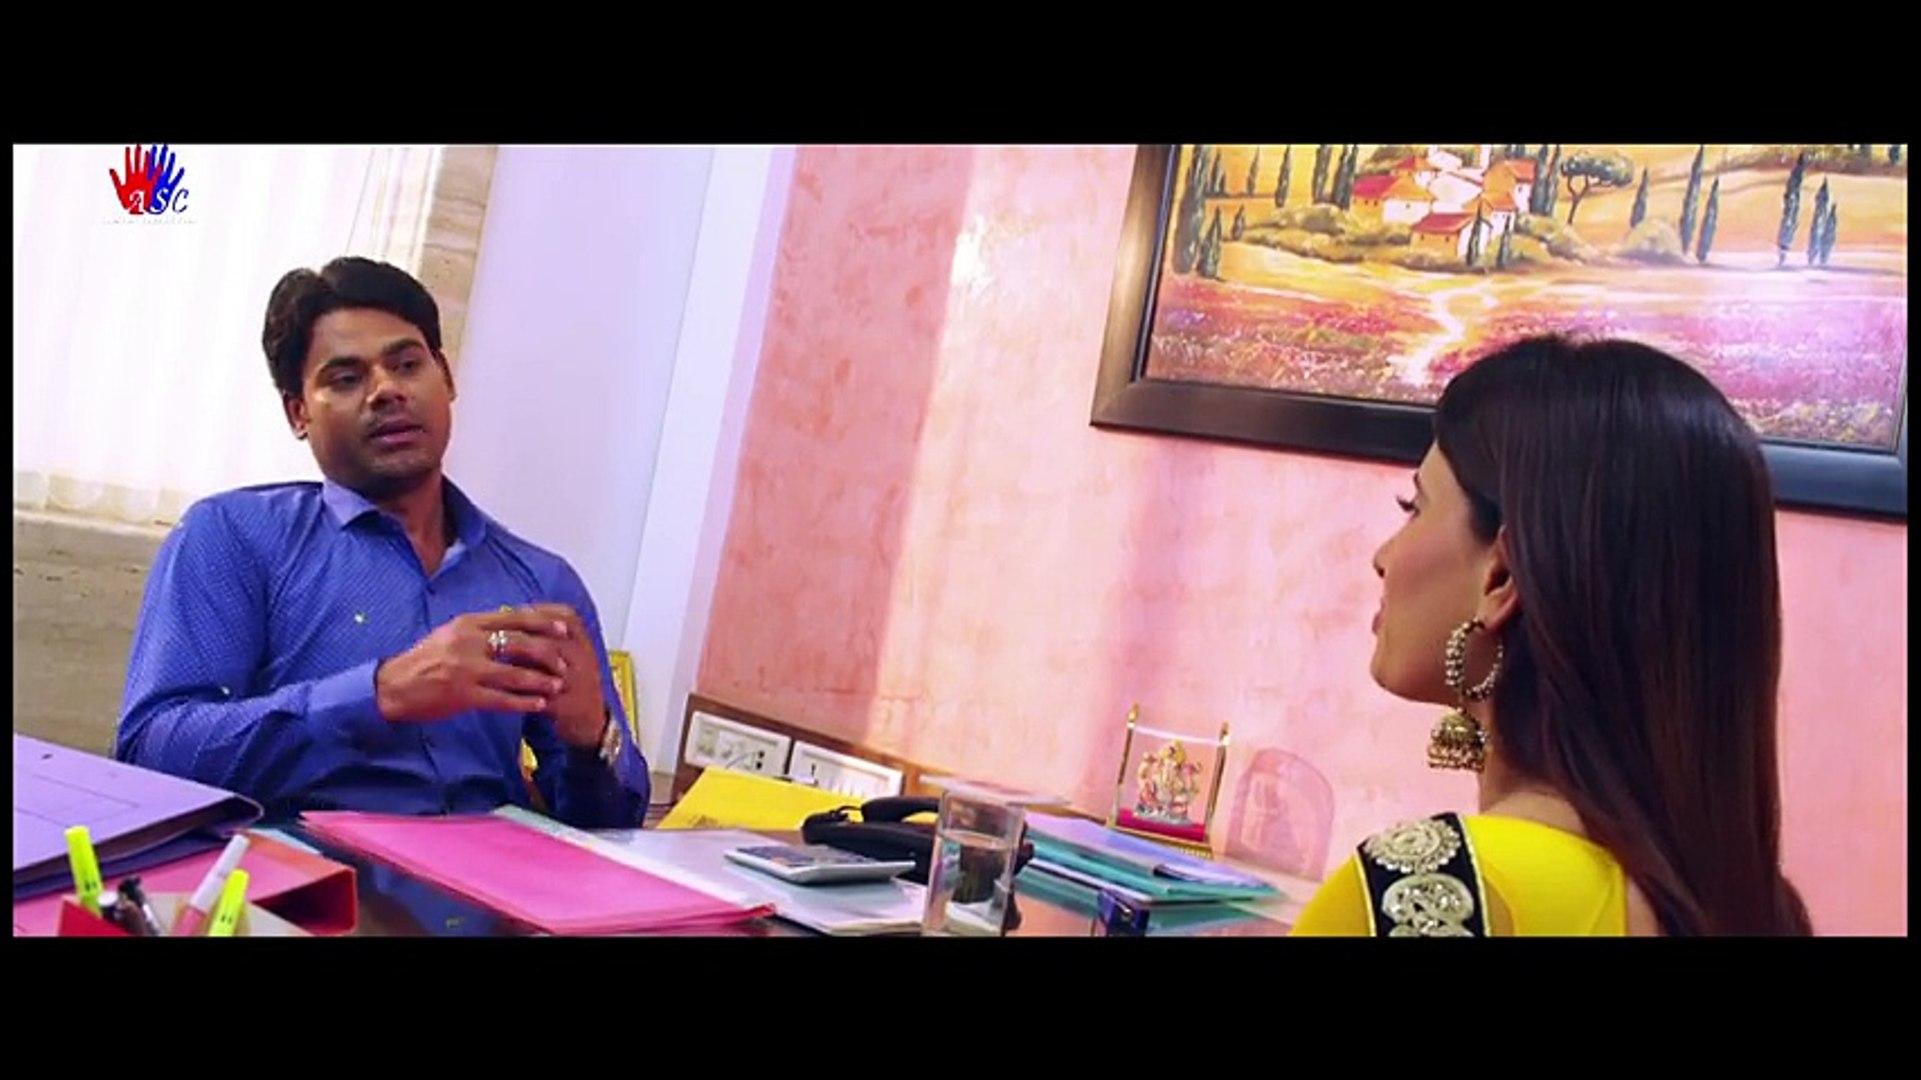 B-Grade Hot Indian Movie Song - Hawas Ki Inteha - New Bhojpuri Hot Song  2016 Full HD